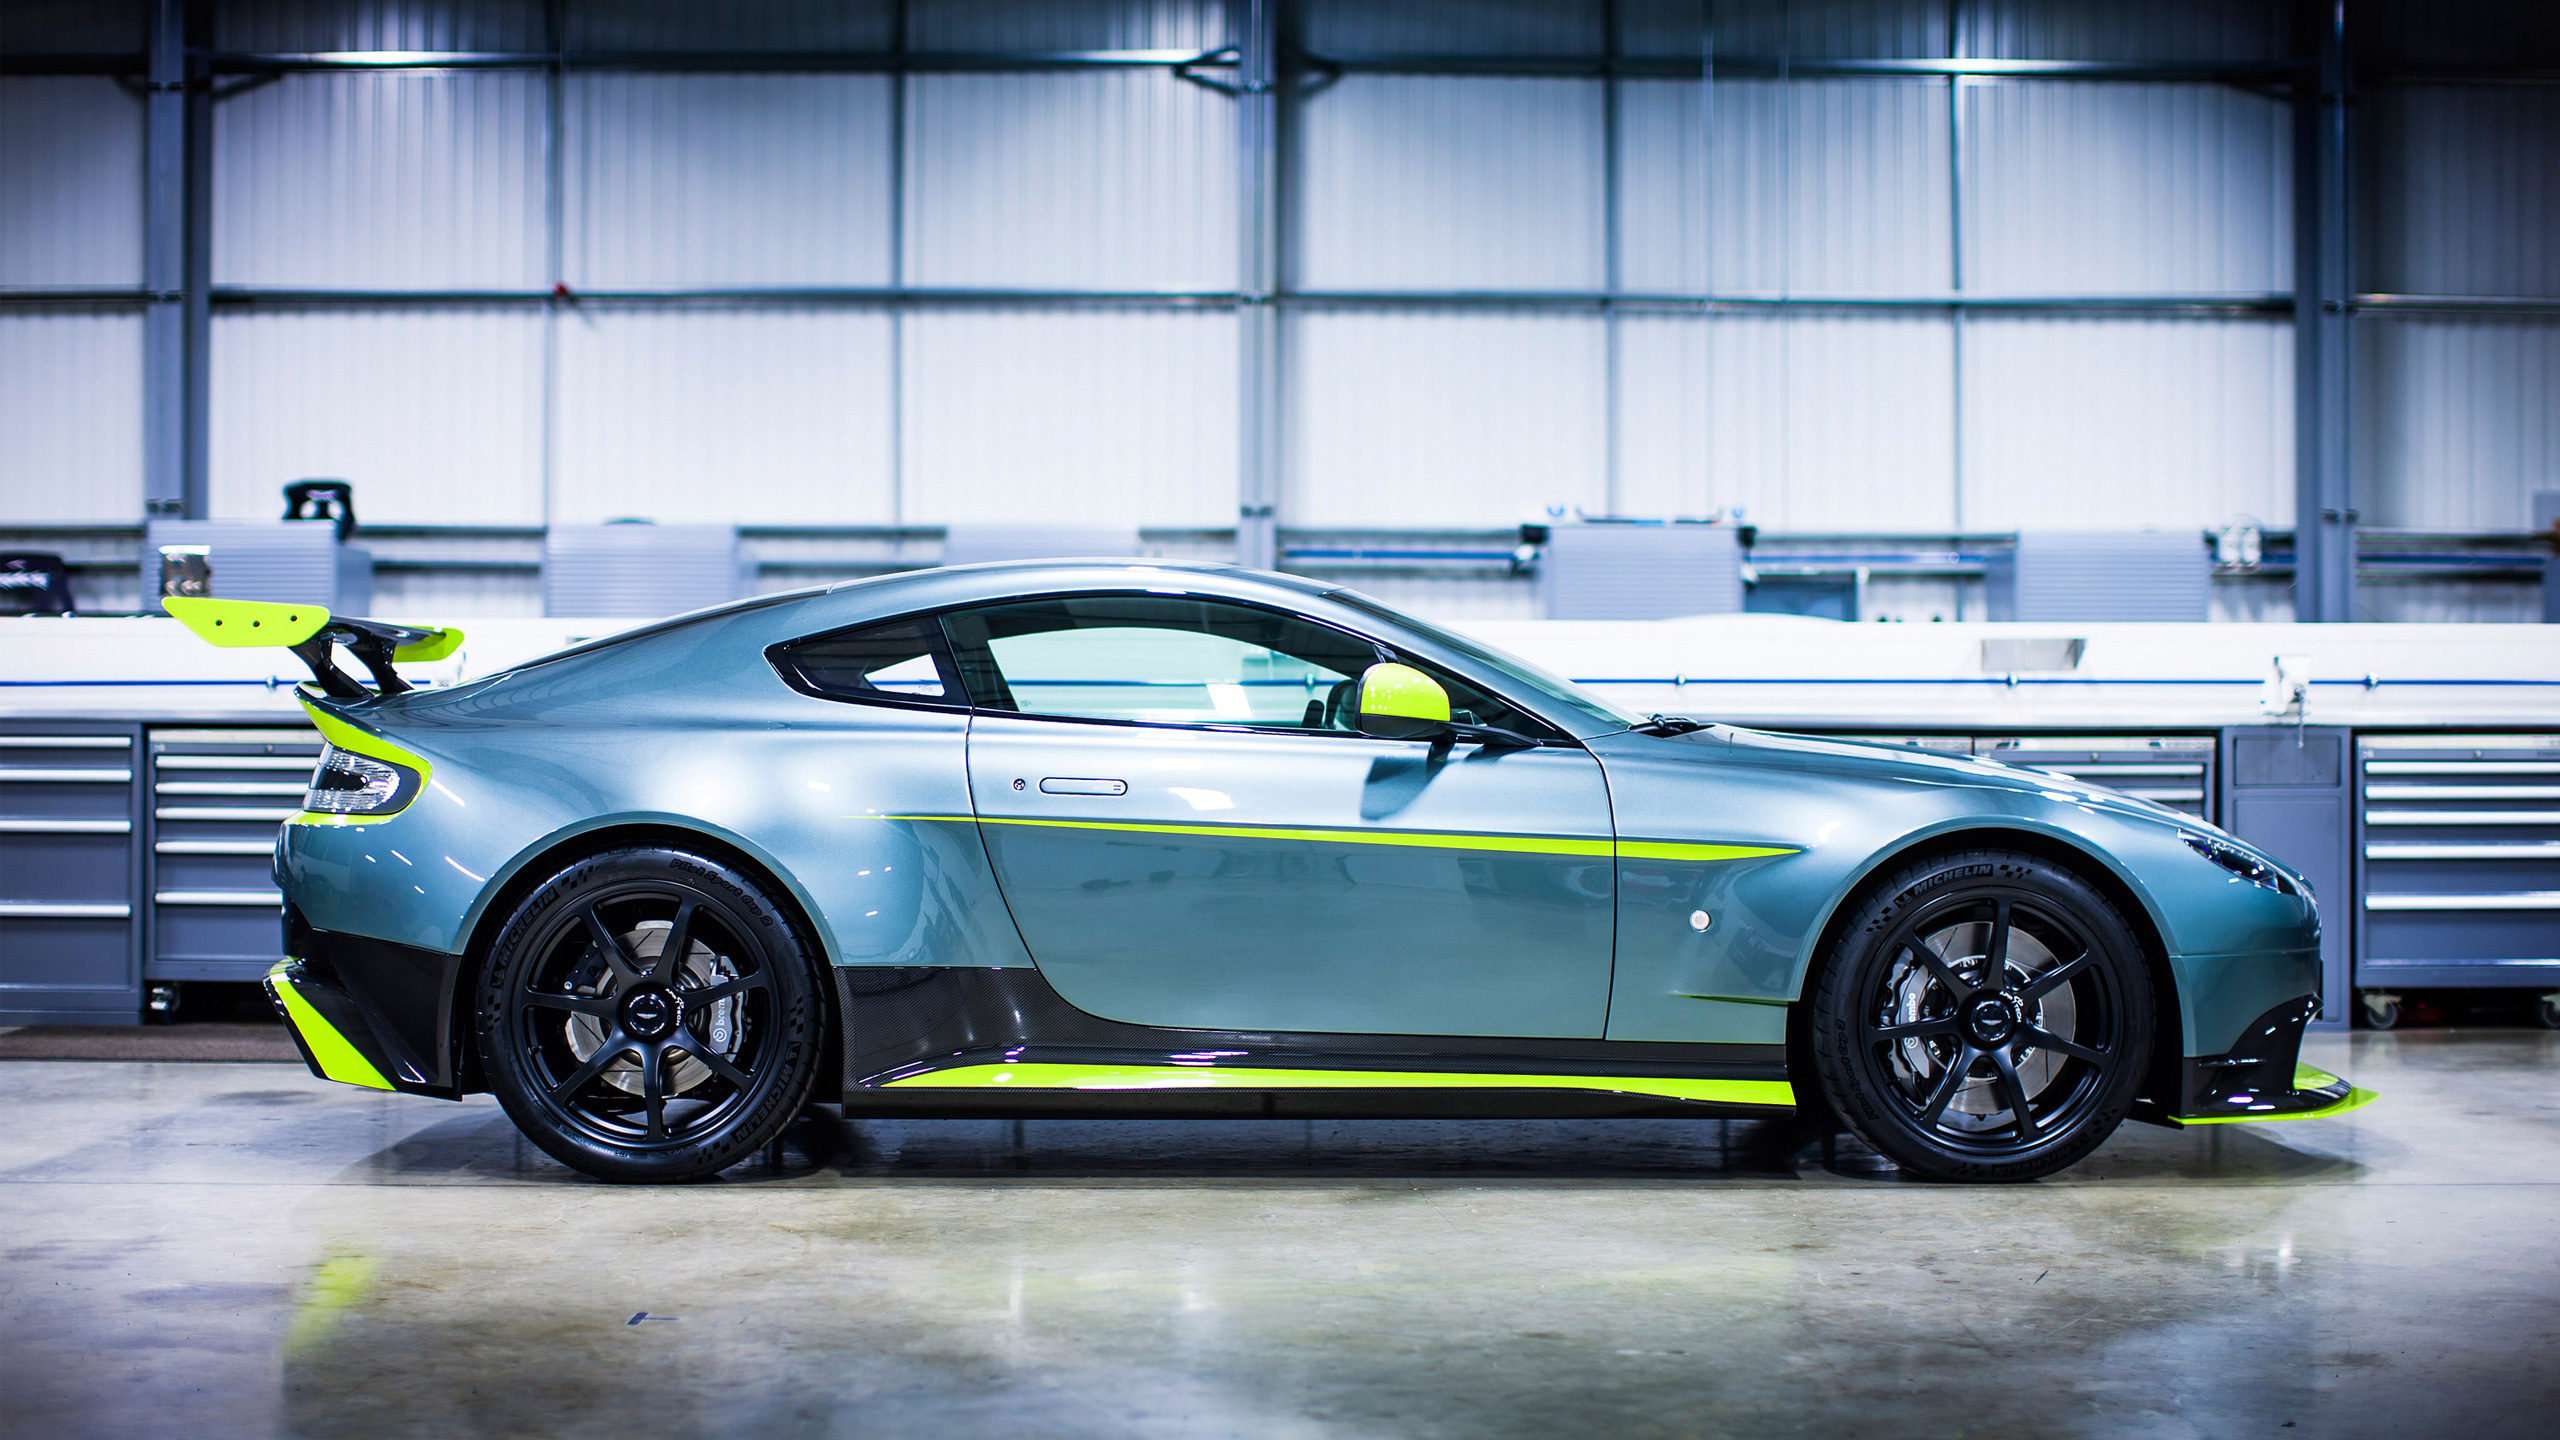 2016 Aston Martin Vantage Gt8 Side View Wallpaper Hd Car